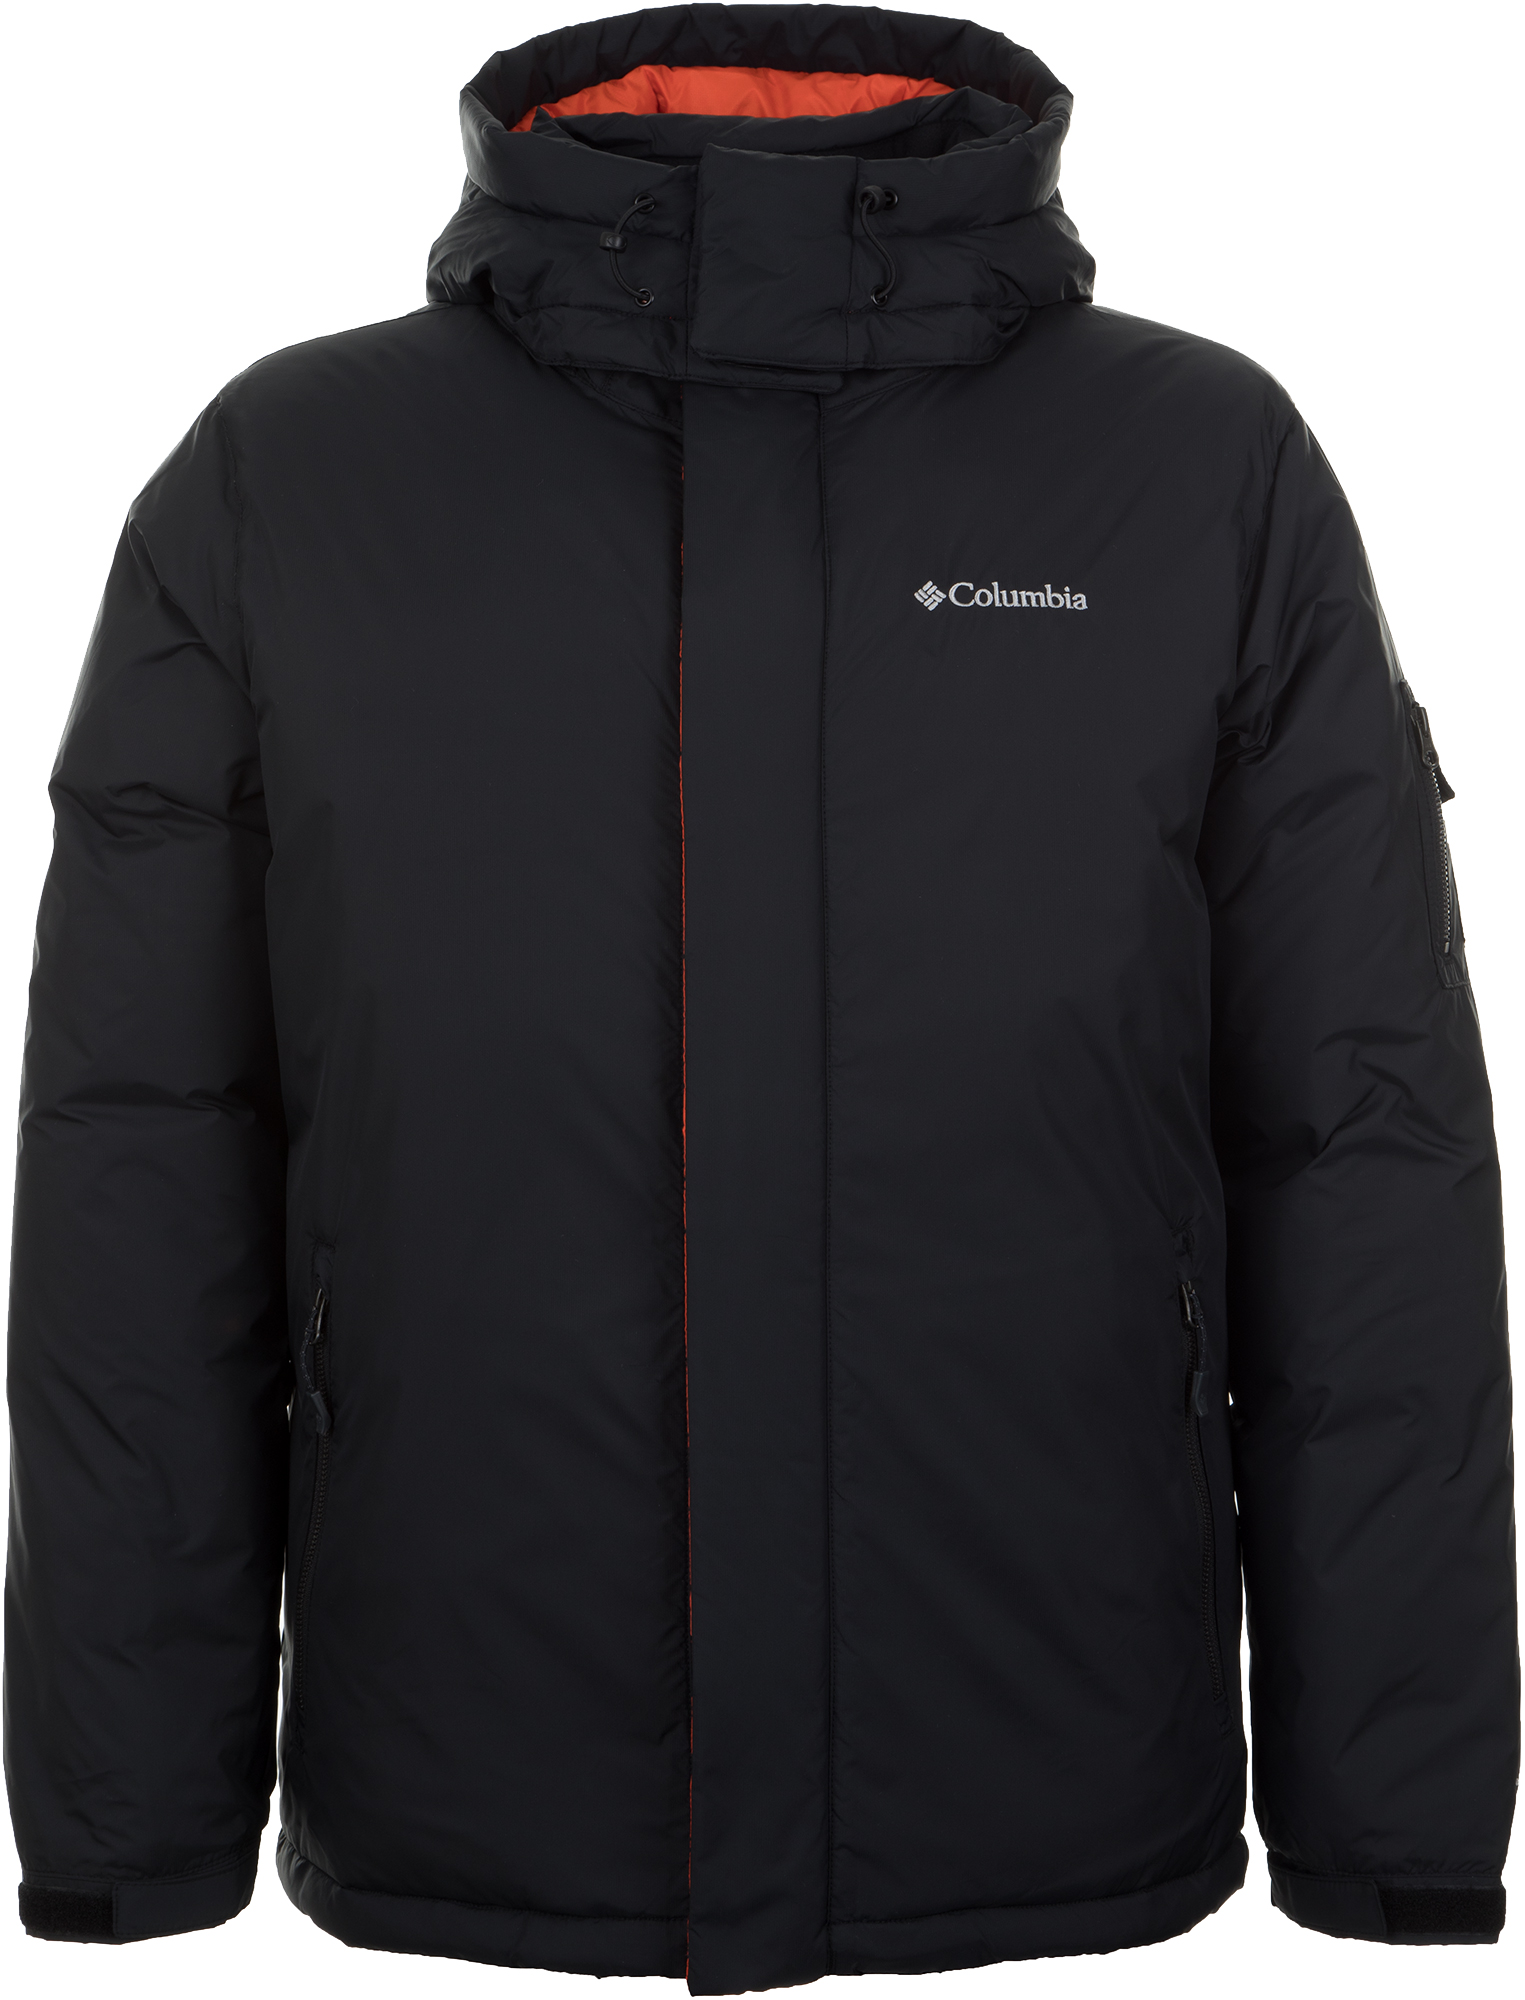 Columbia Куртка пуховая мужская Columbia Wildhorse Crest, размер 48-50 crest 200g